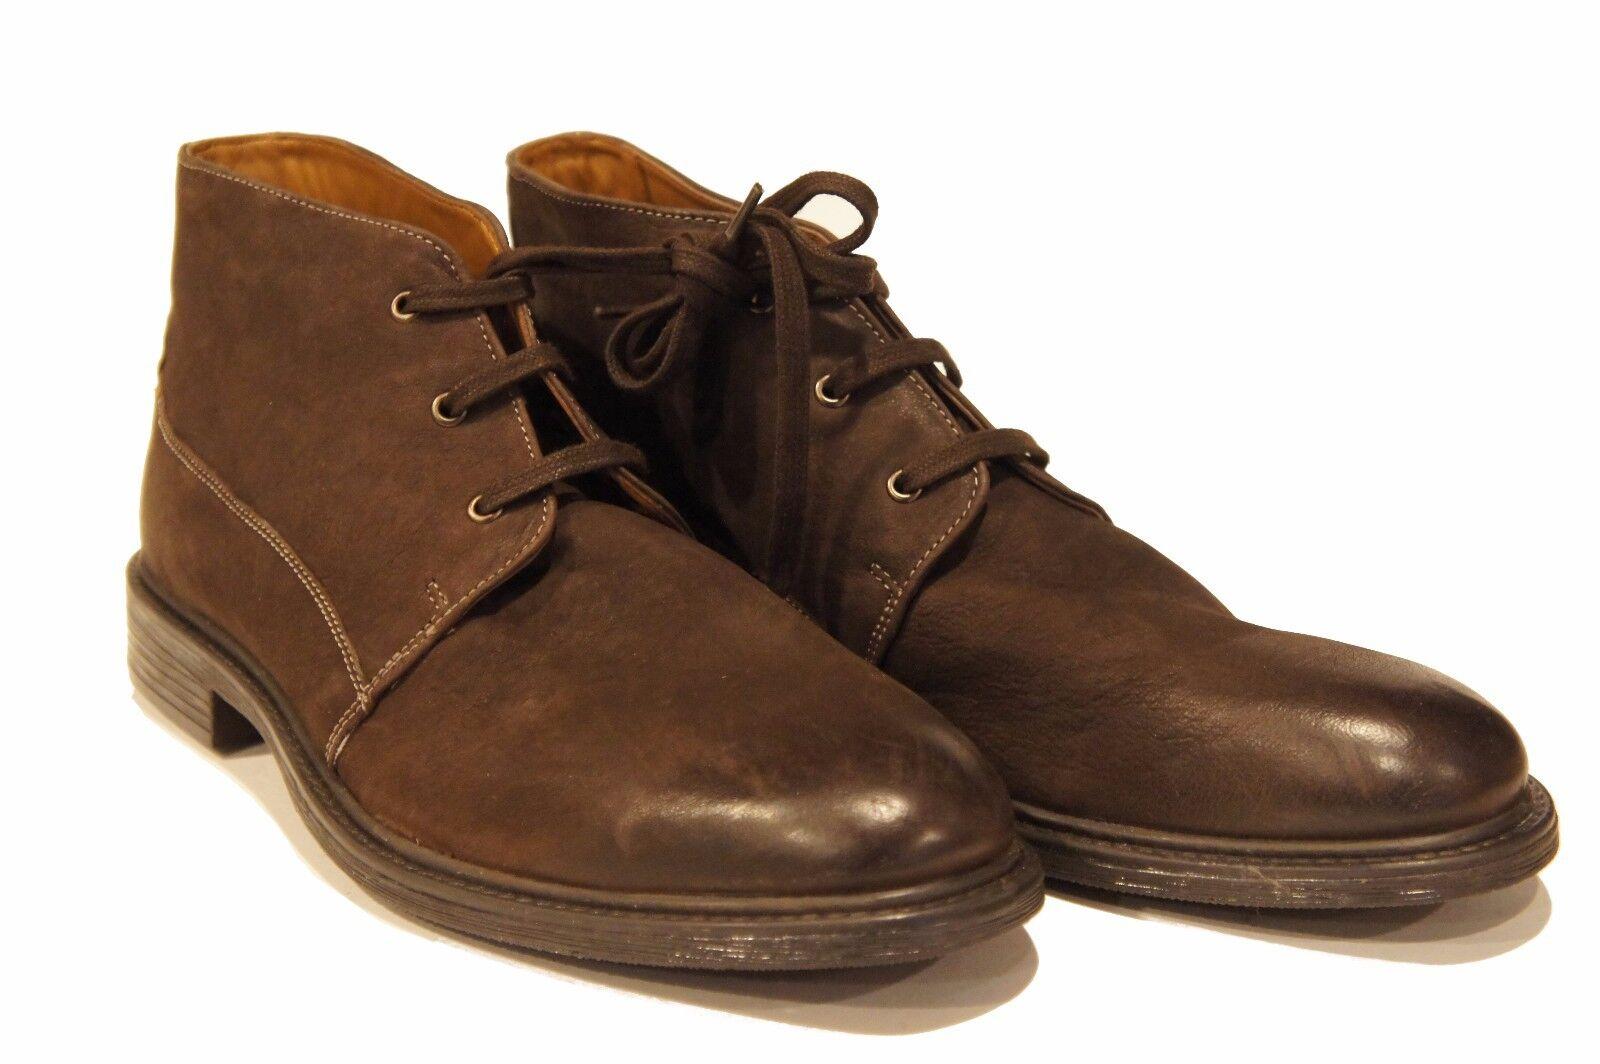 Bostonian Men's Wakeman Top Dark Brown Oxford Leather Dress Ankle Boots 11 M